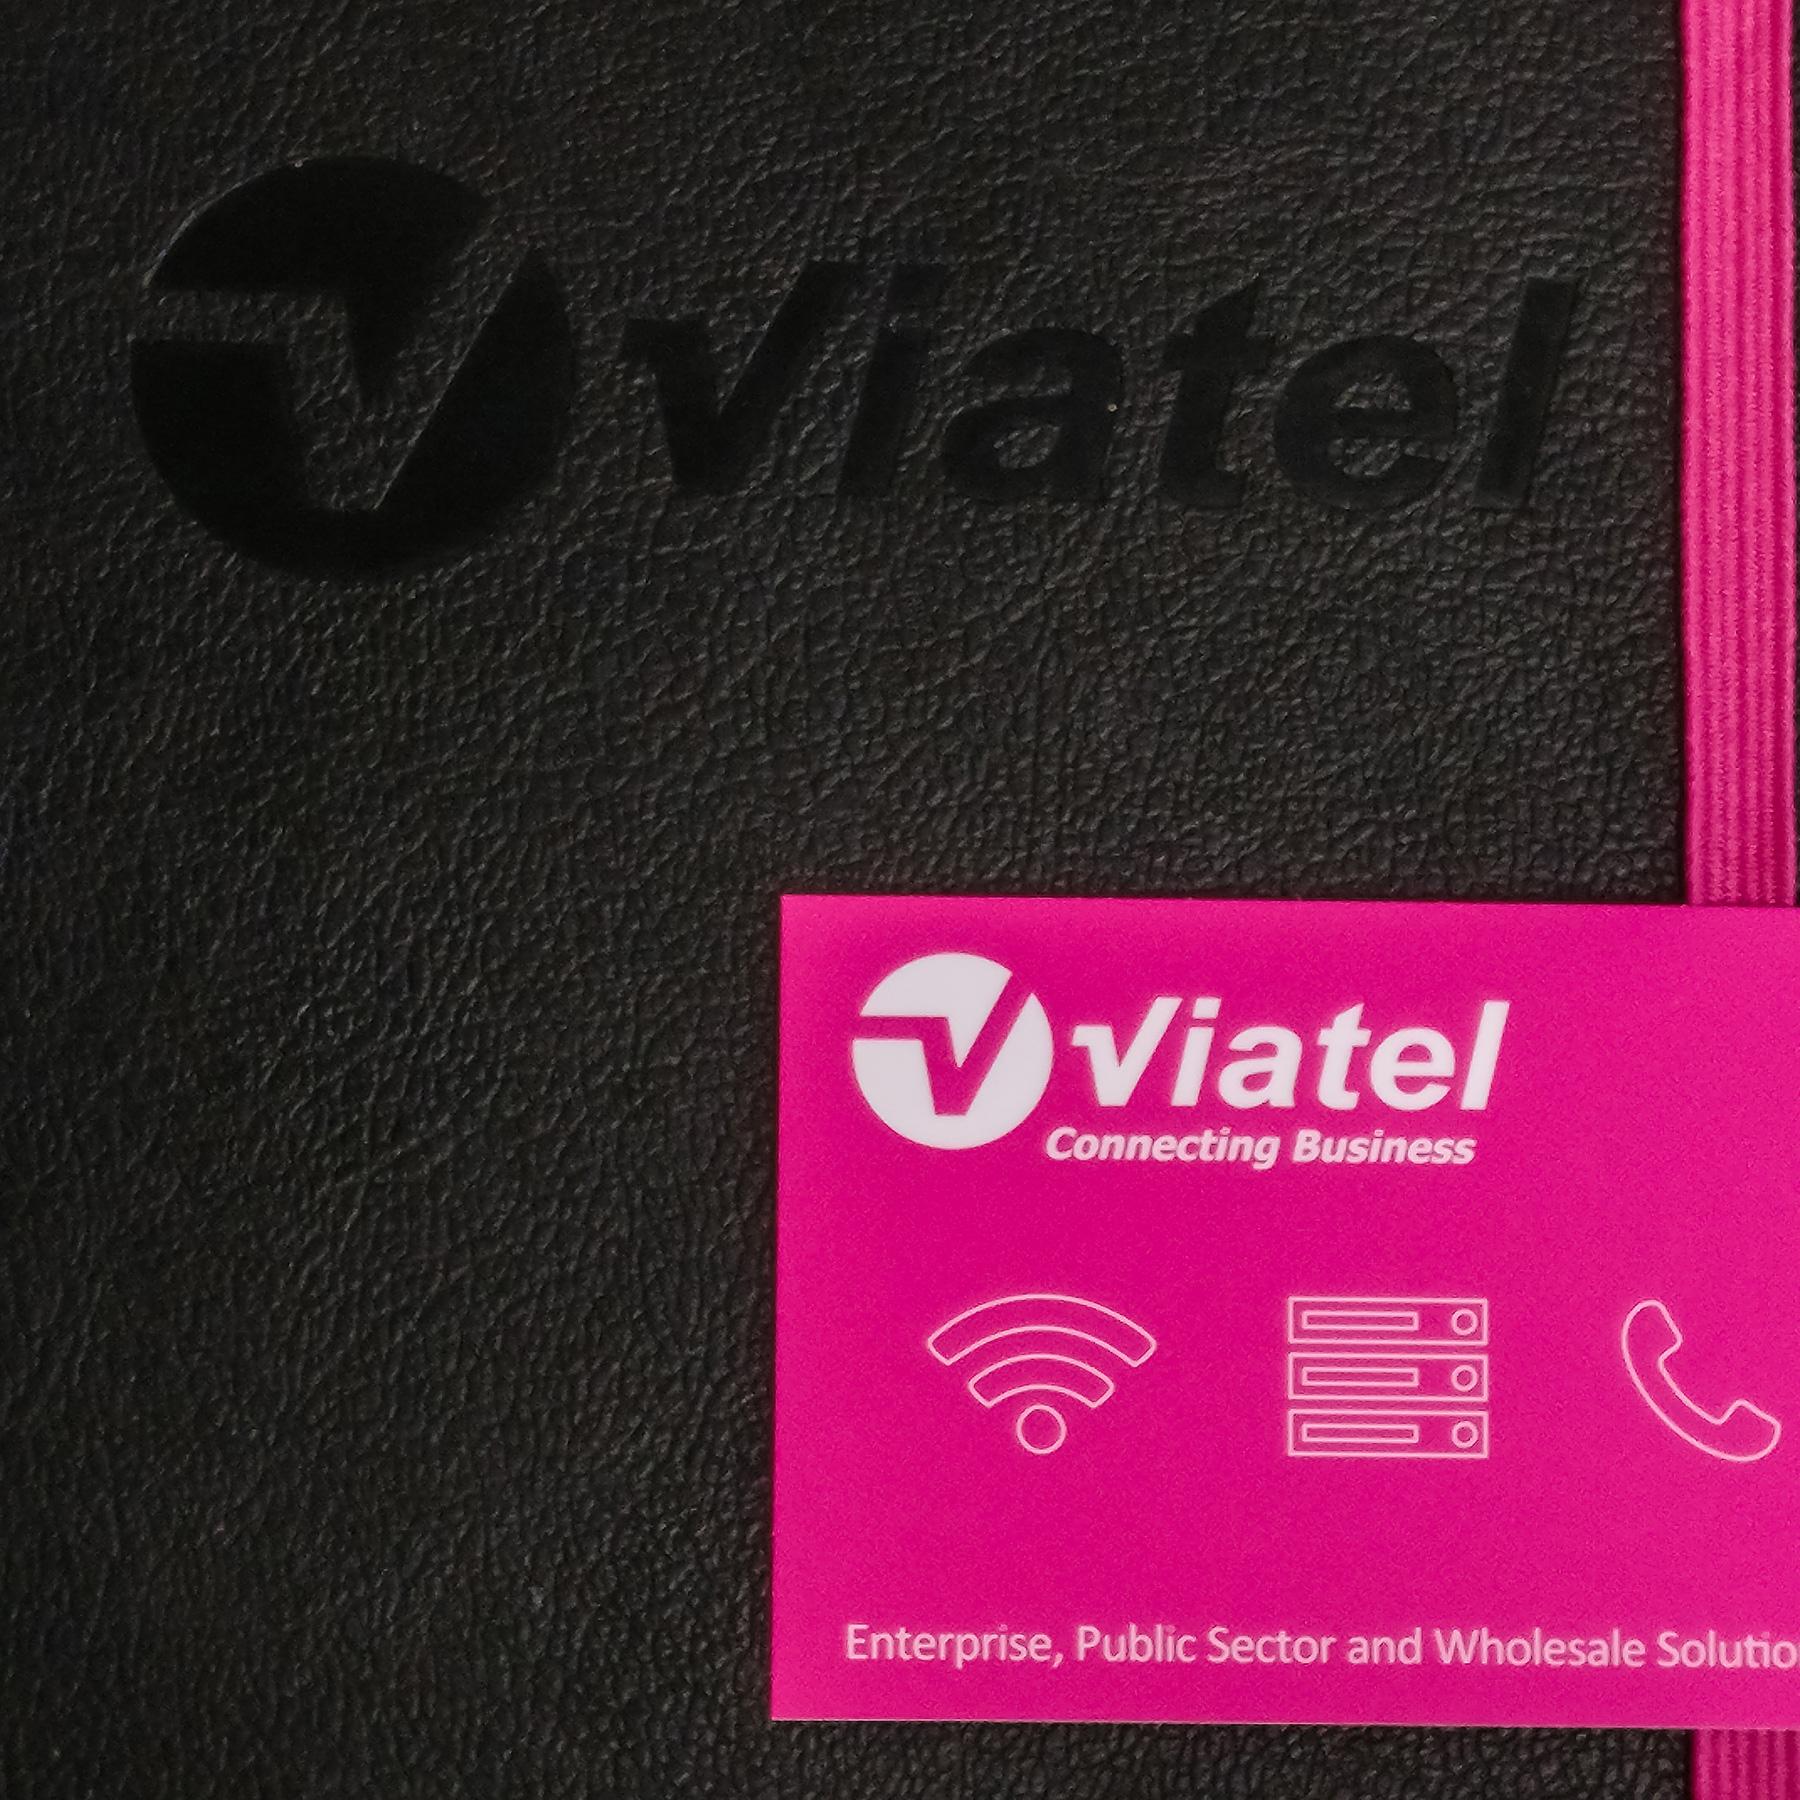 viatel-set-1